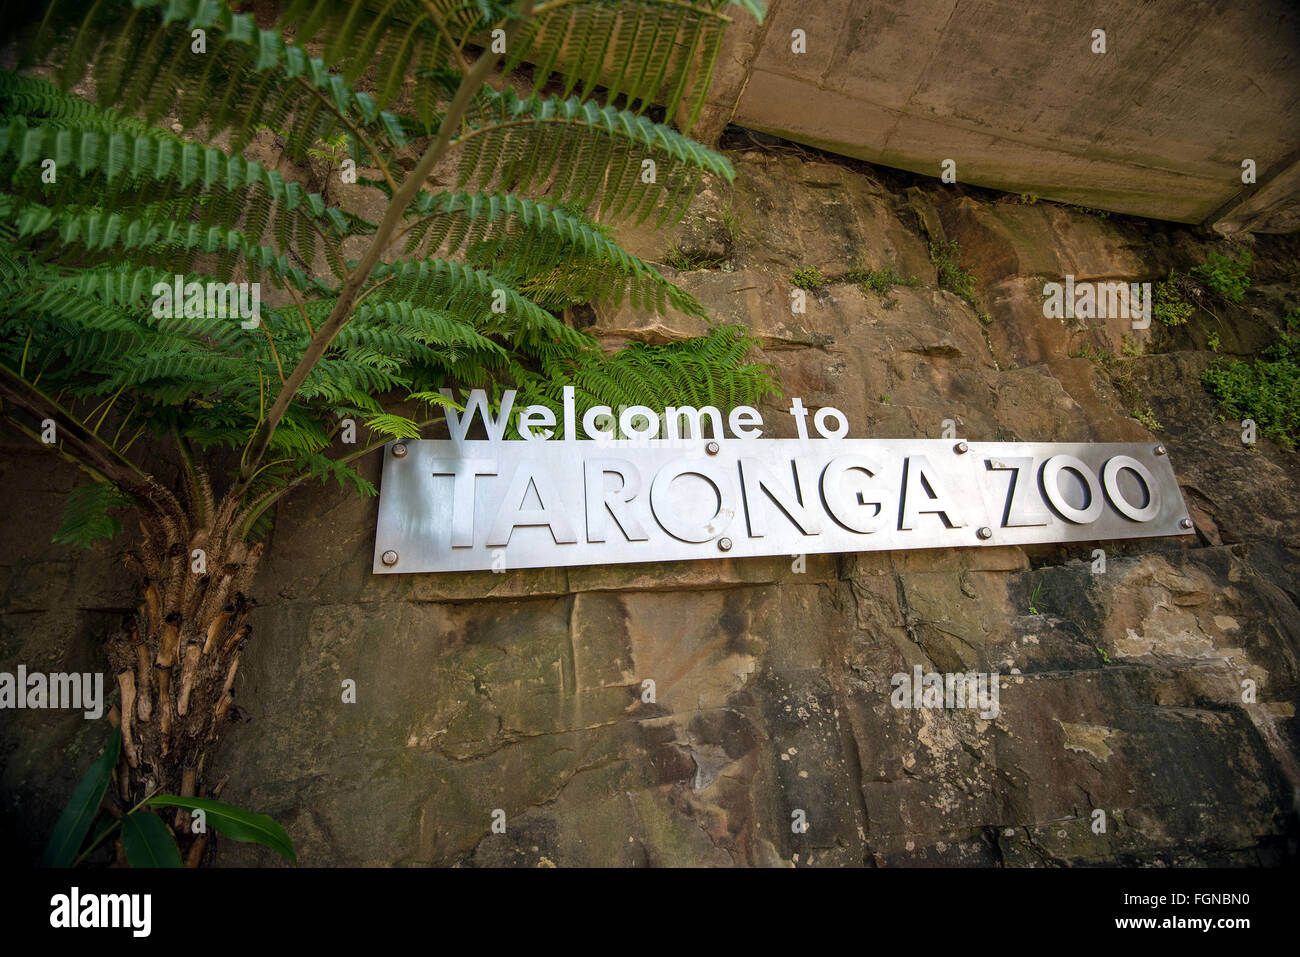 Sydney, Australia - November 09, 2015: Taronga Zoo sign mounted on the rocks at the entrance. Taronga Zoo is managed - Stock Image